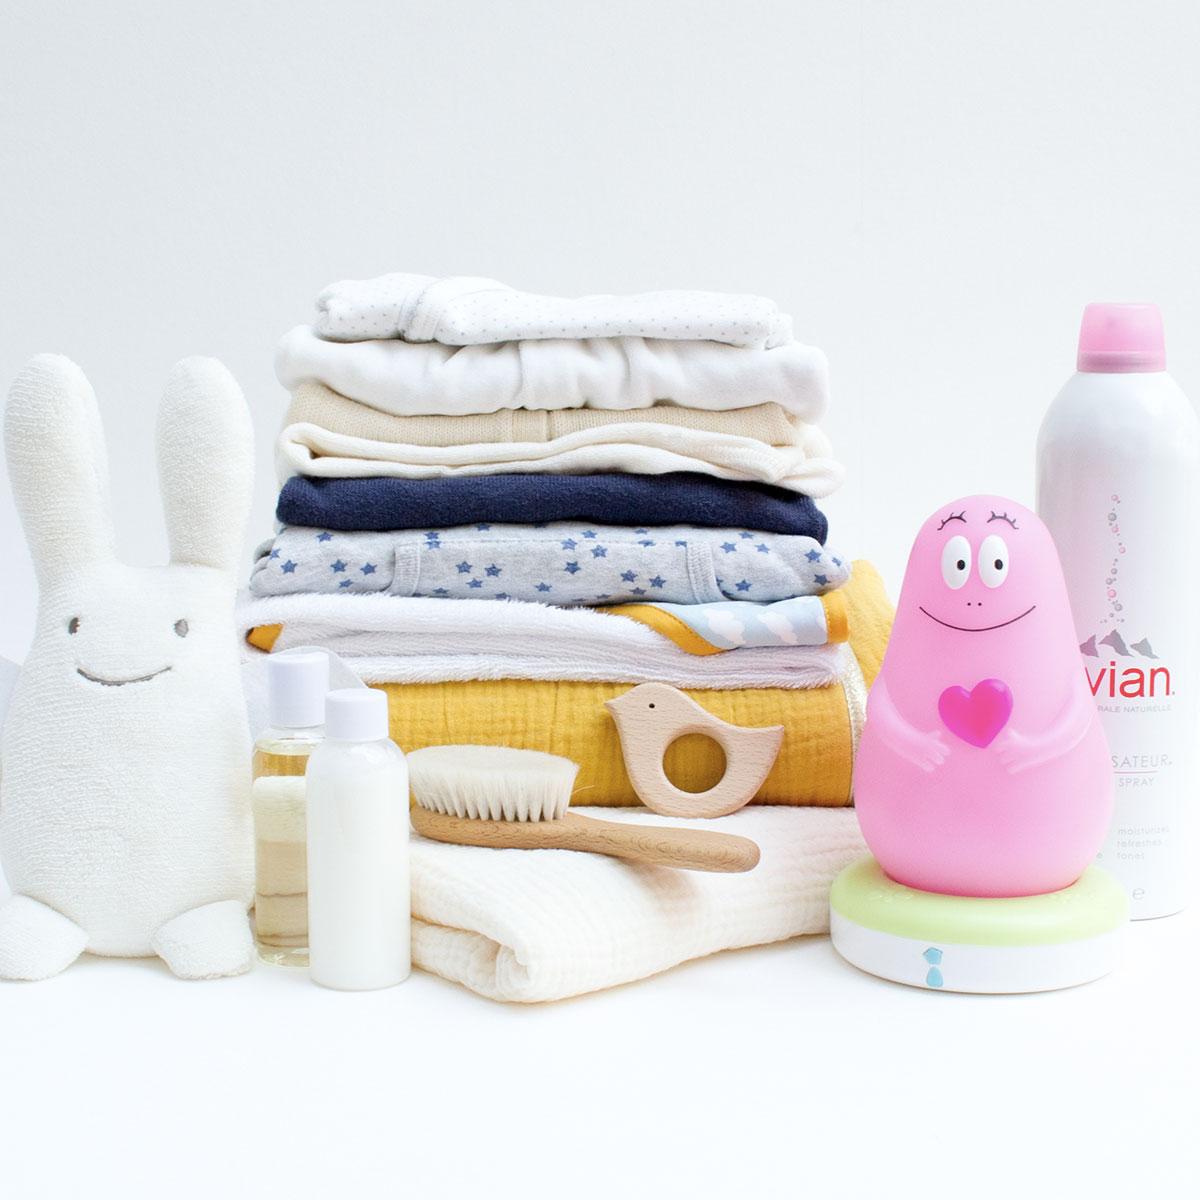 preparer ma valise de maternite